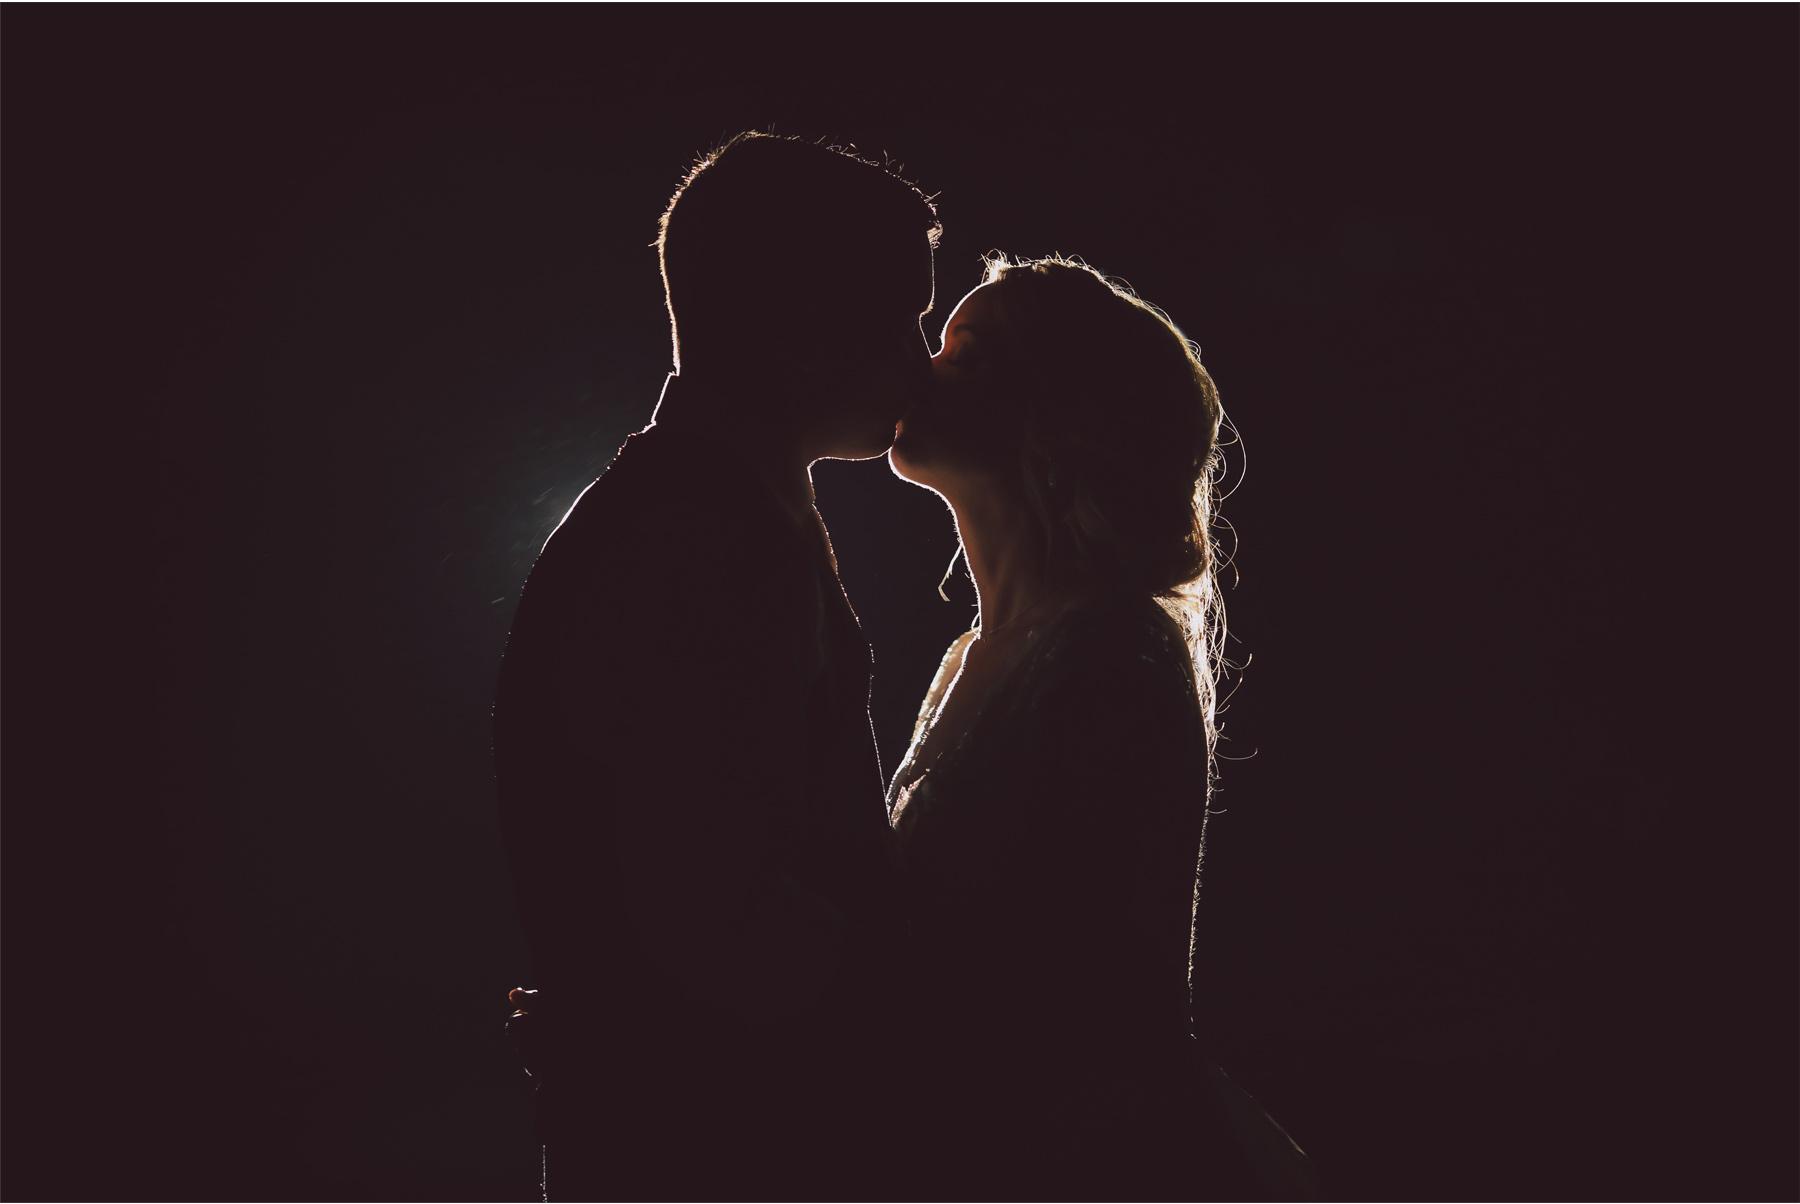 20-Minnetonka-Minnesota-Wedding-Photography-by-Vick-Photography-Lafayette-Club-Night-Photography-Jennifer-and-Adam.jpg